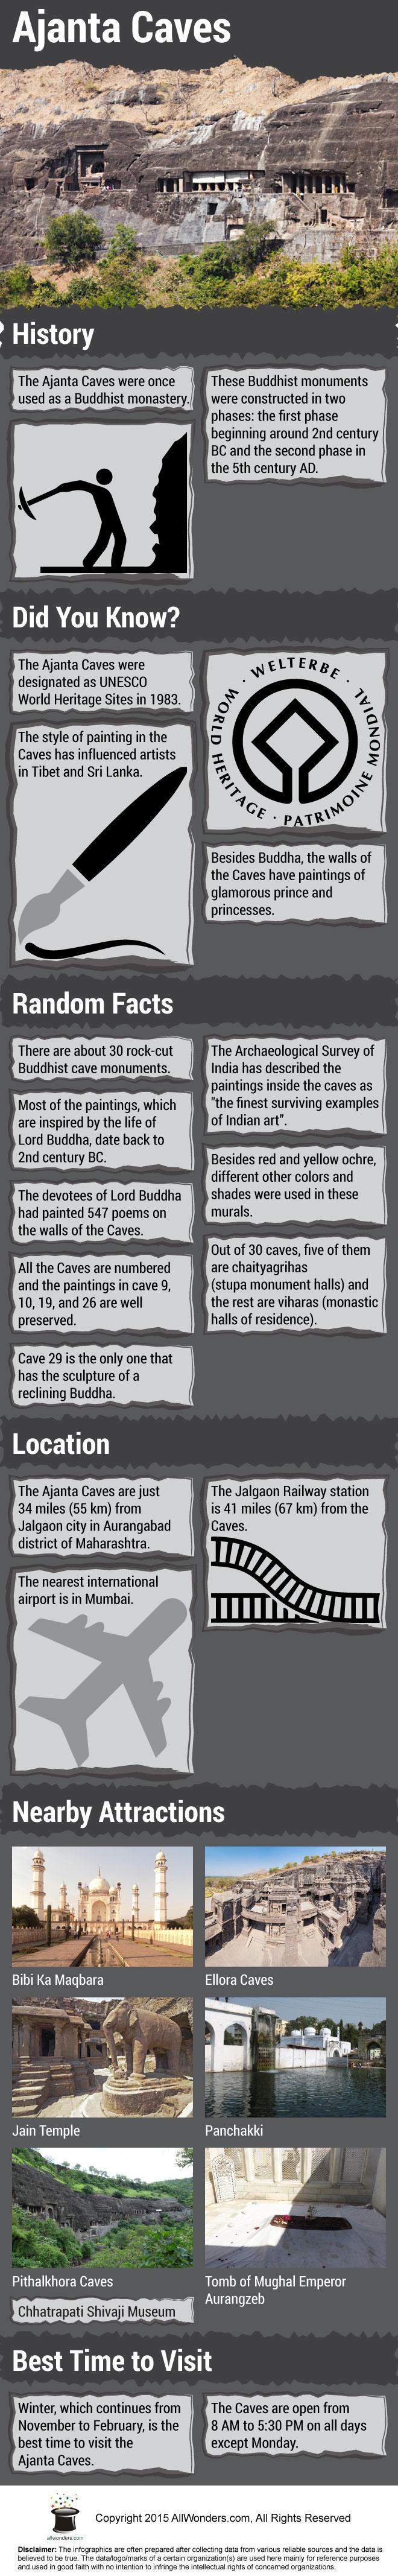 Ajanta Caves Infographic